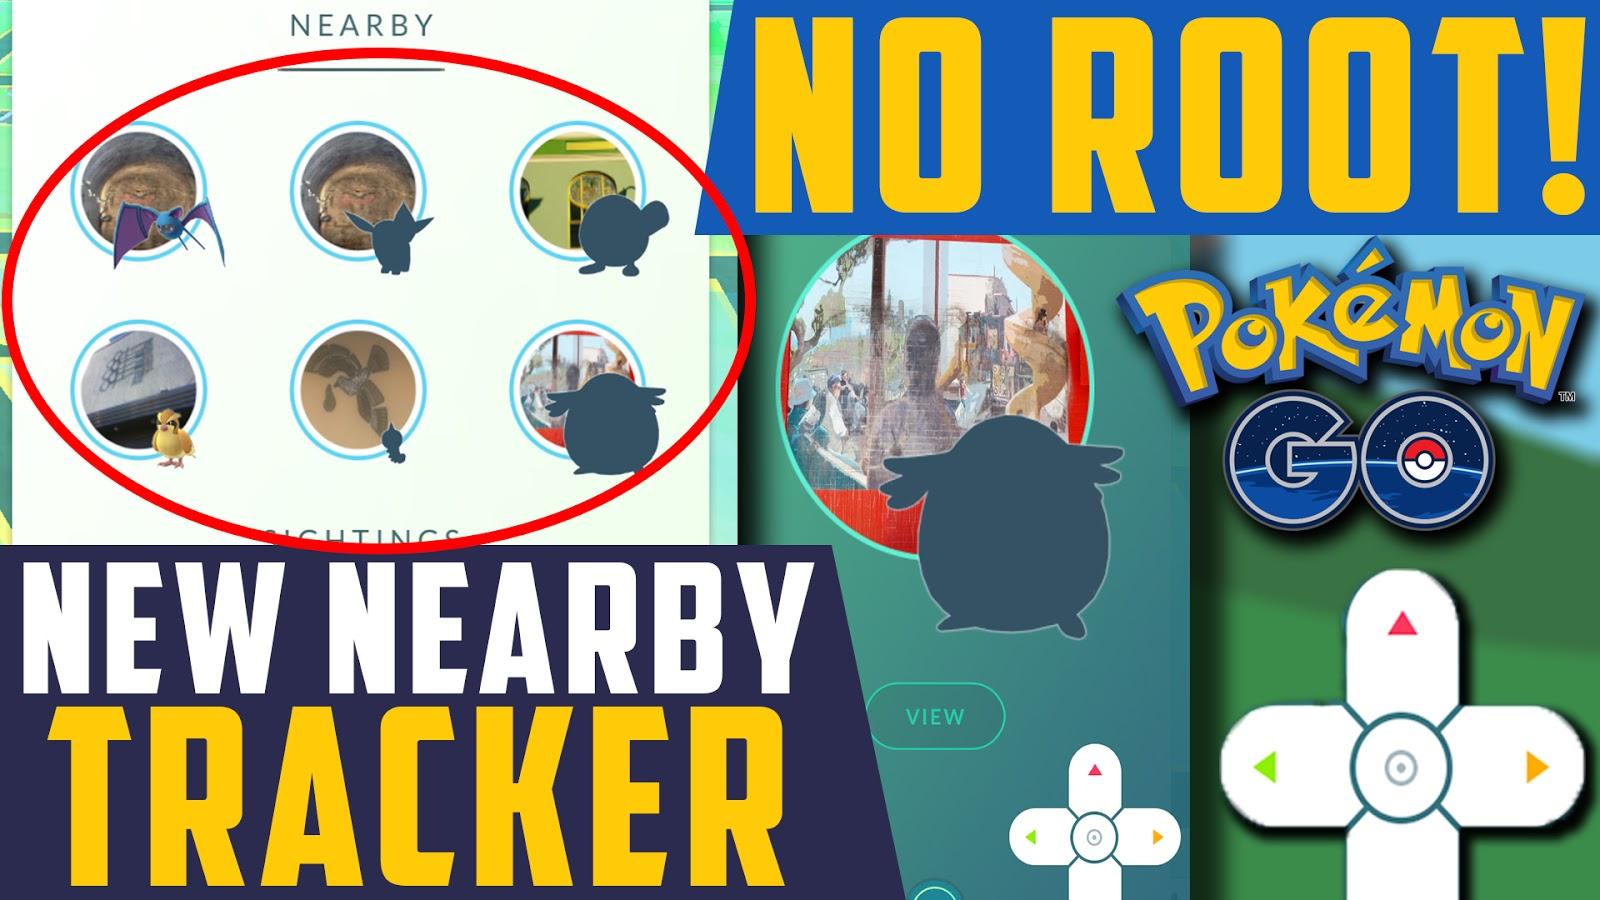 joystick download for pokemon go